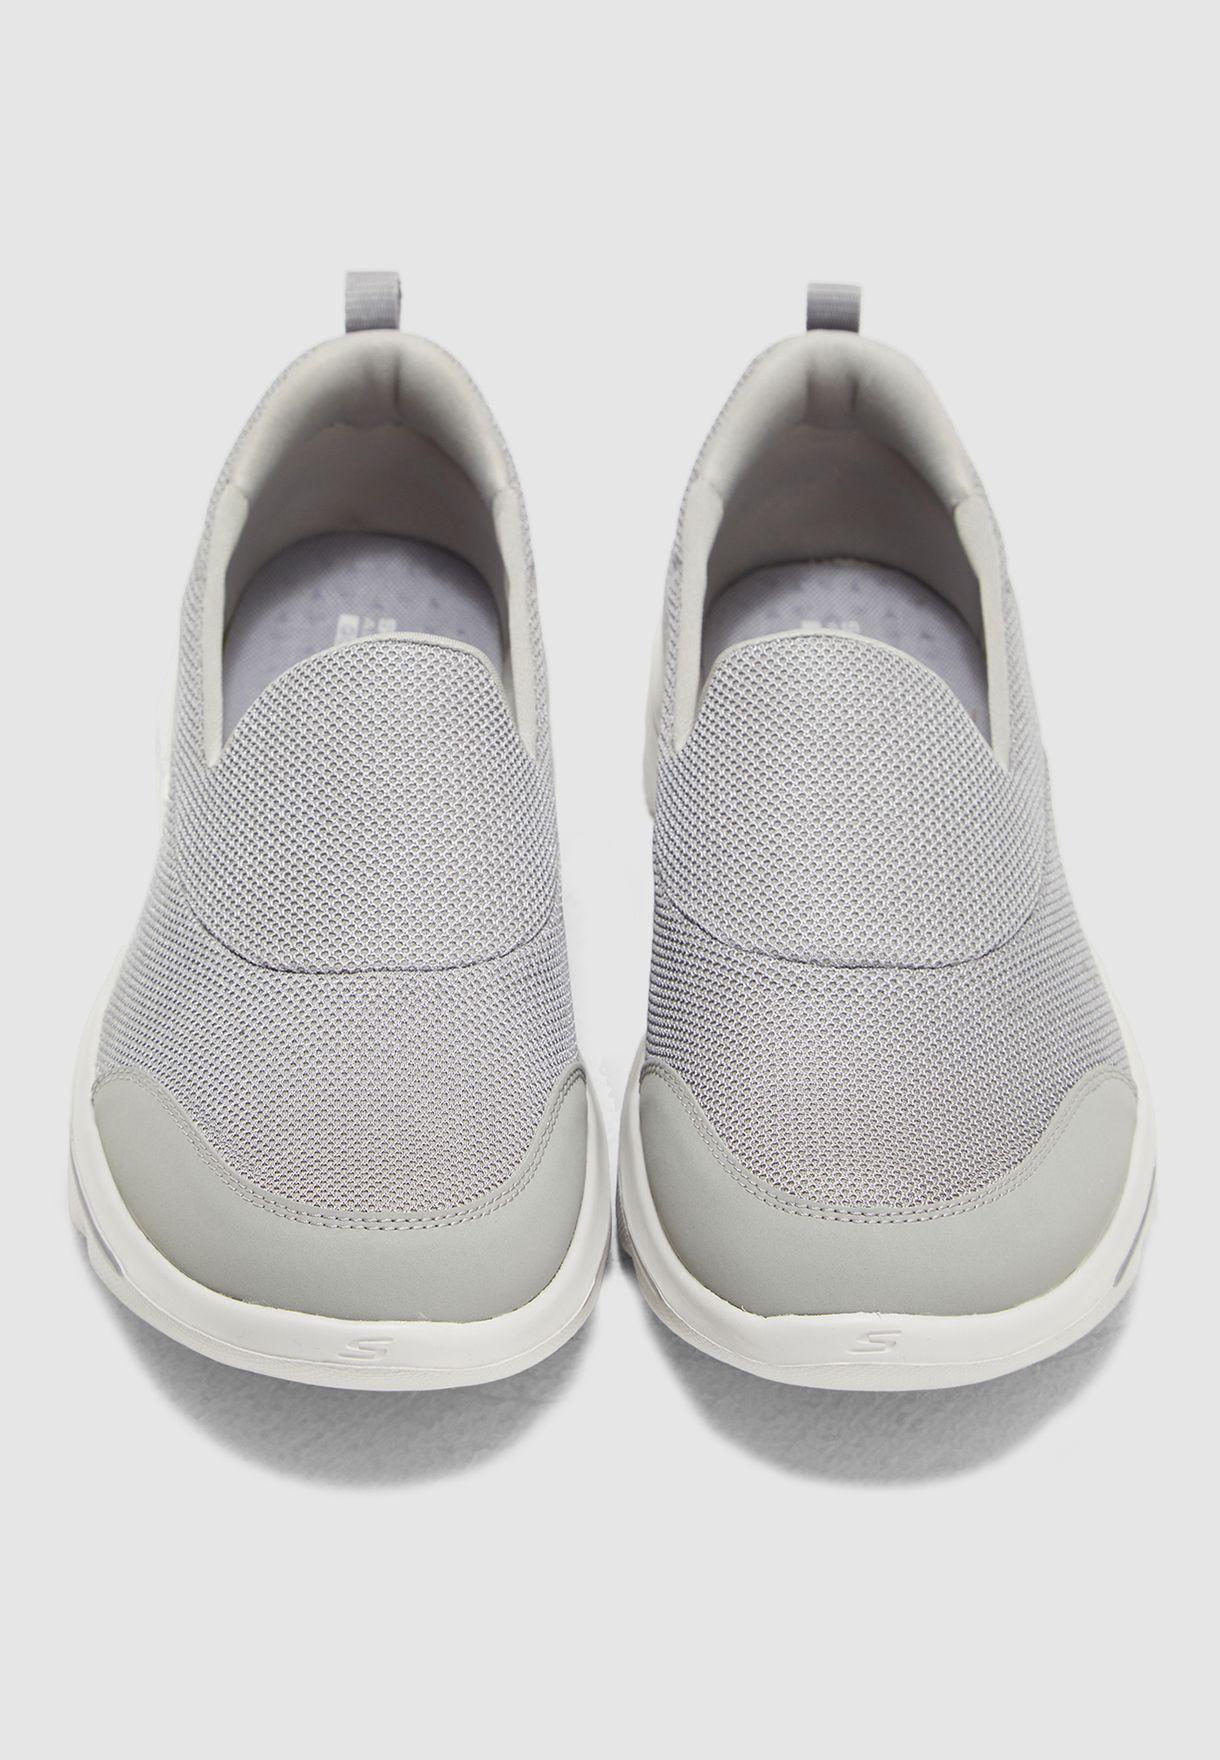 حذاء جو ووك ايفوليوشن الترا